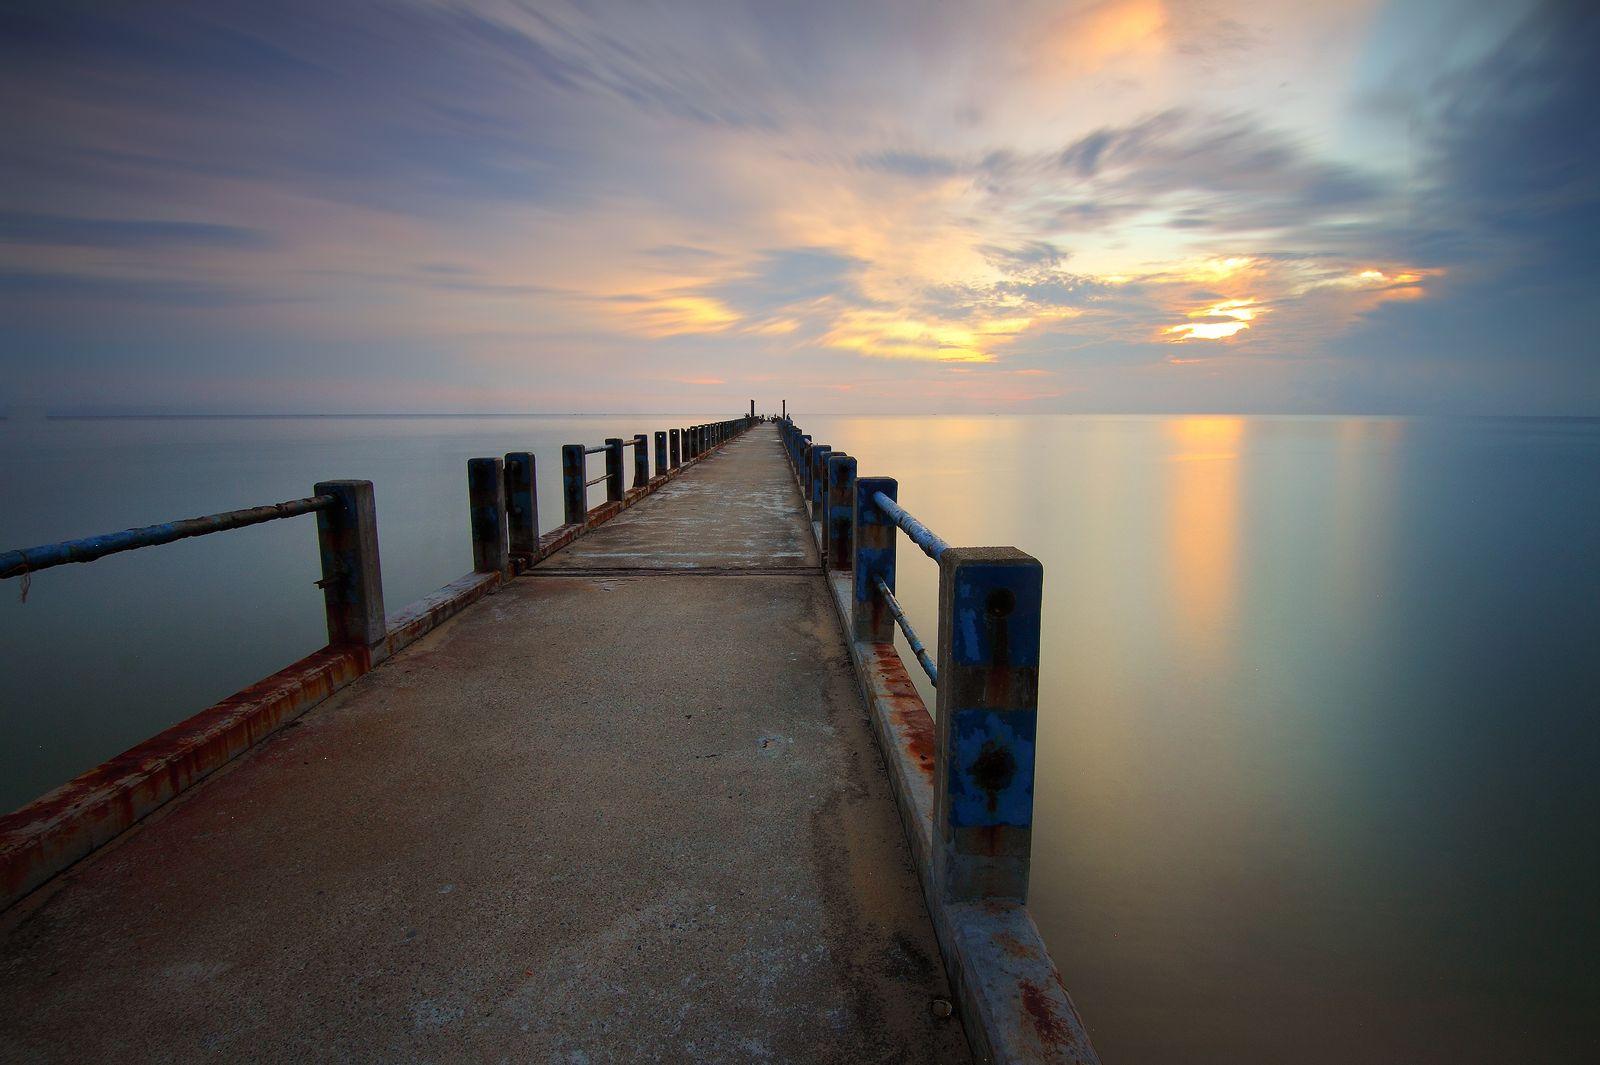 Water Sea Landscape Ocean Sunset Beach Sunrise Lake - Men Thinking Wallpaper Hd - HD Wallpaper